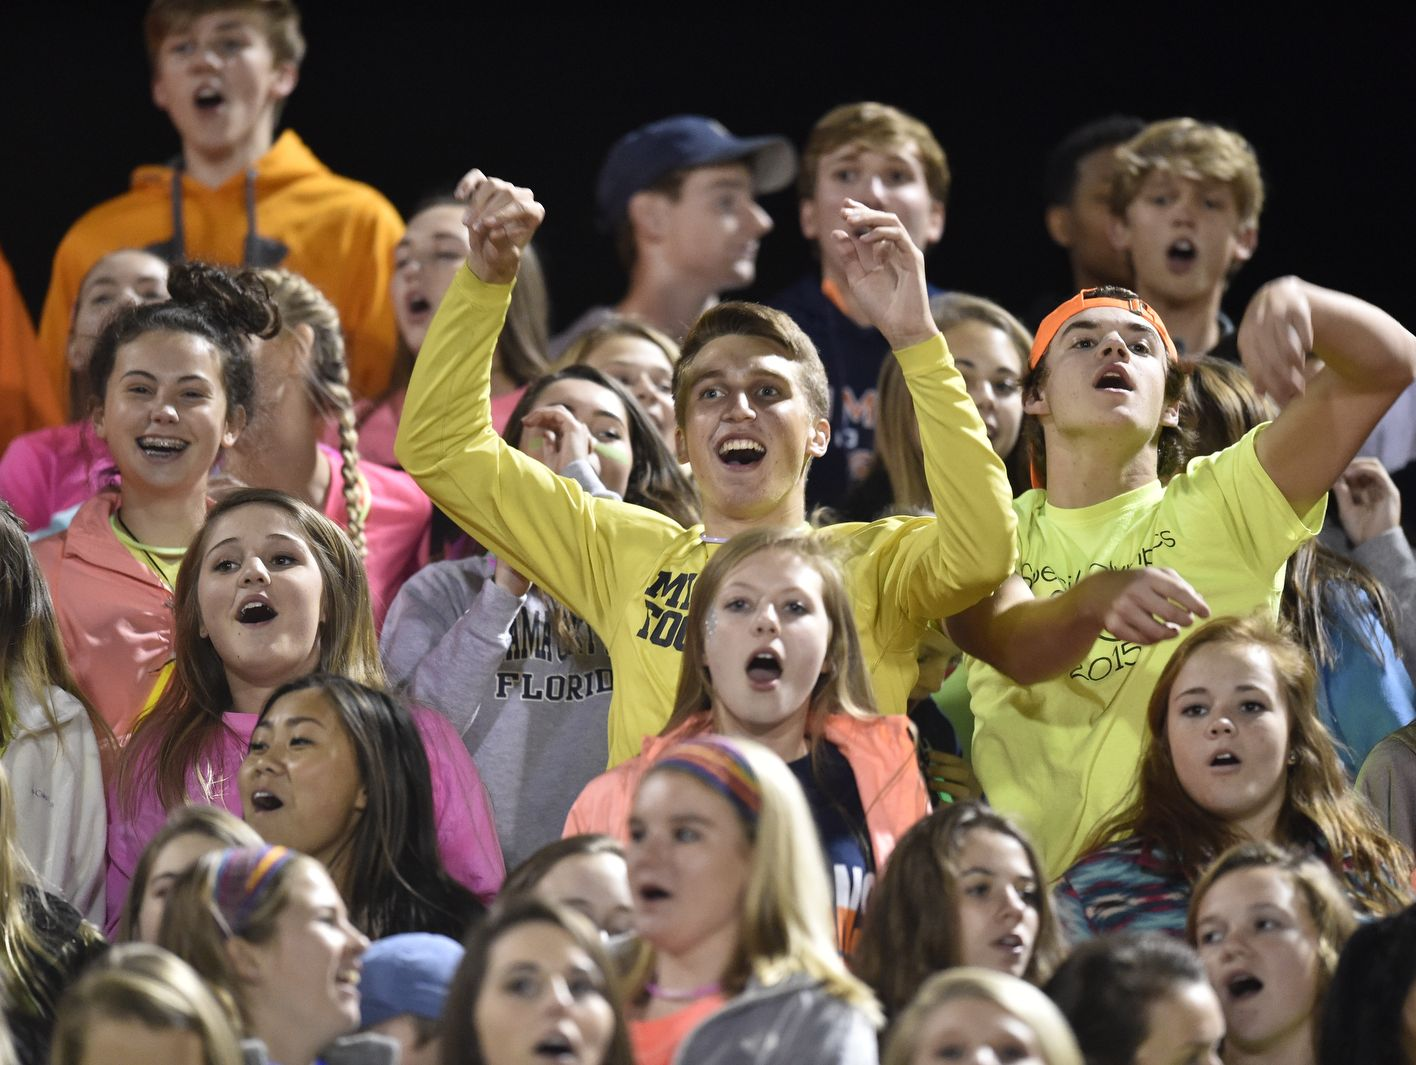 Summit High School fans celebrate a touchdown against Cane Ridge High School.